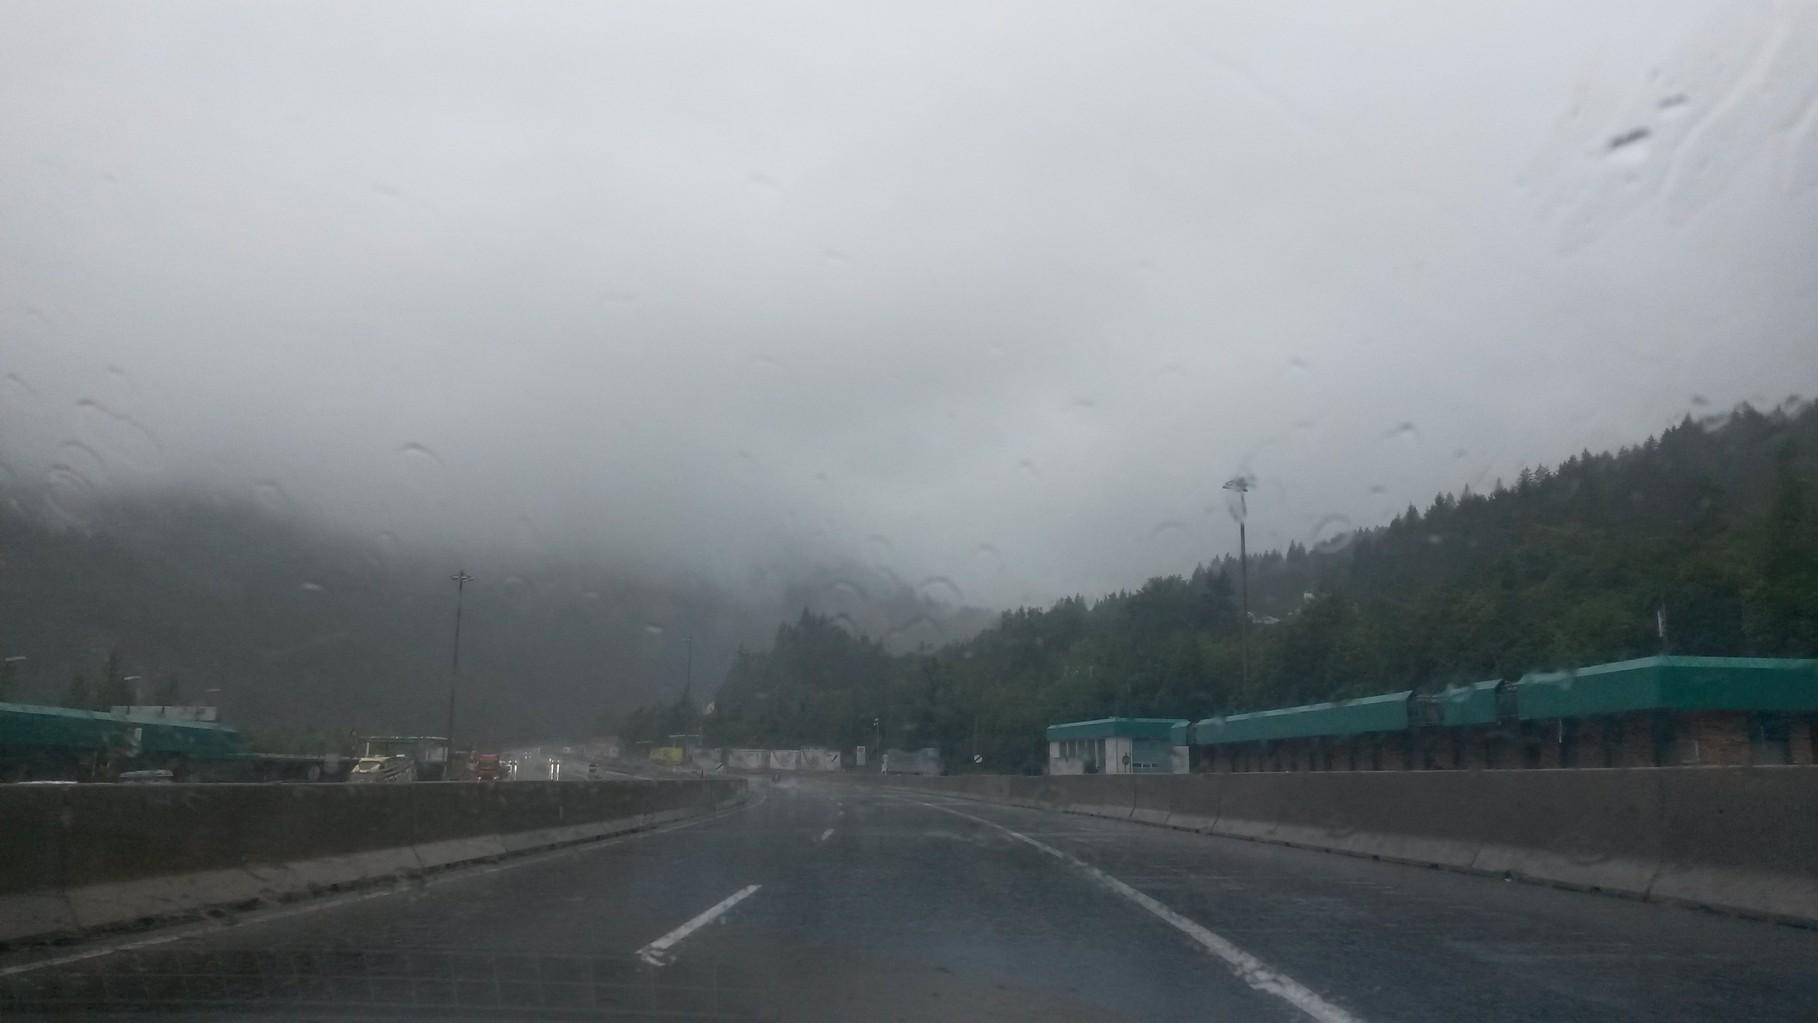 Bei Regen in den Alpen - nix zu sehen!